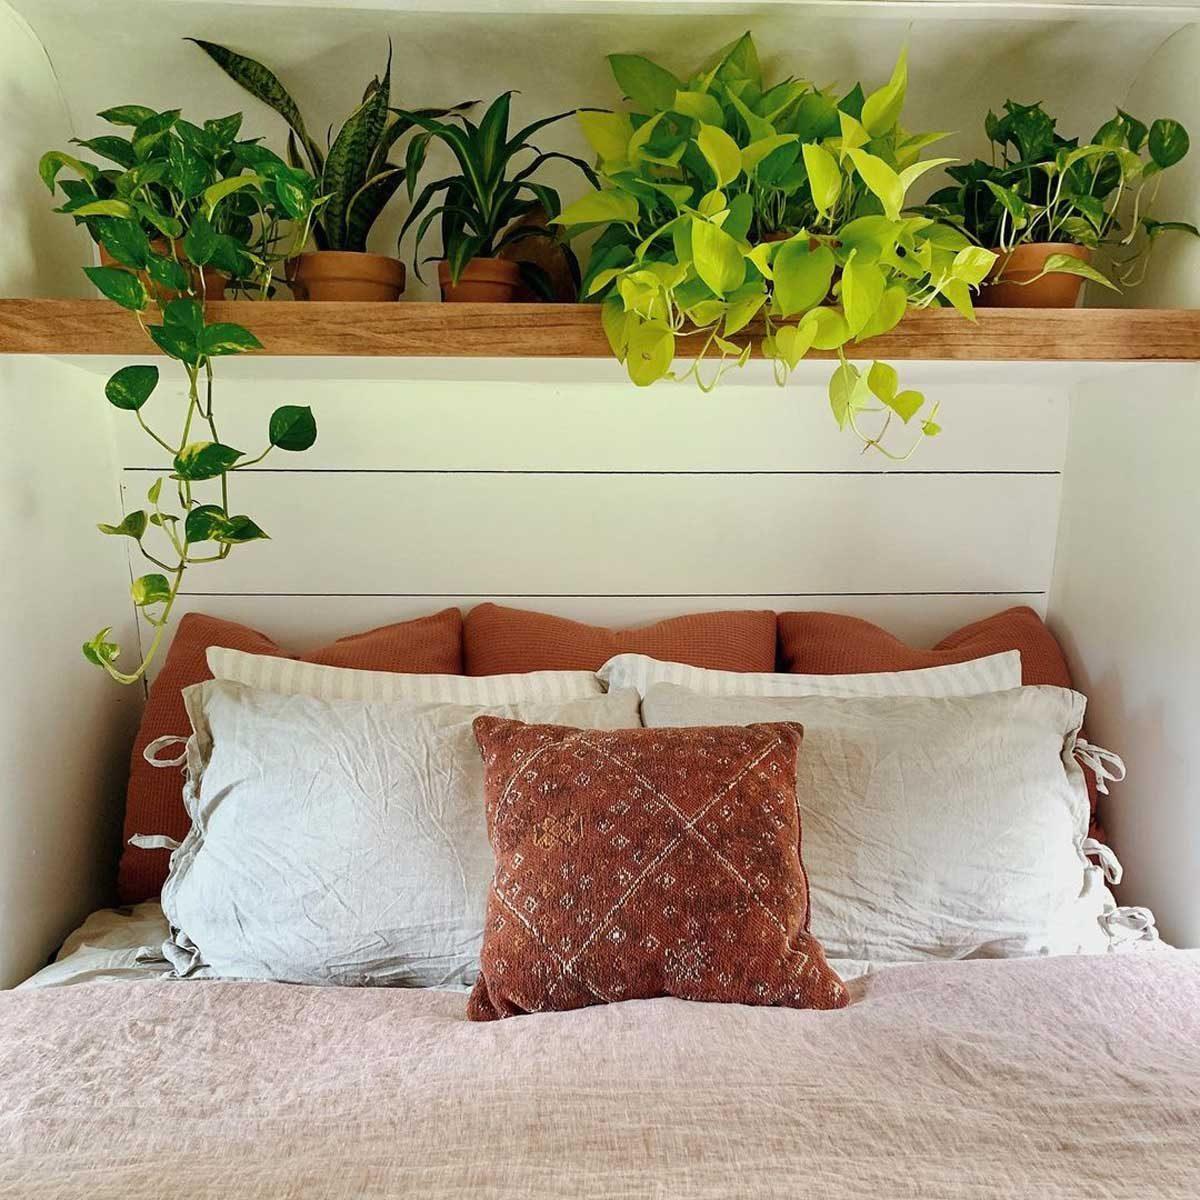 Tinyhome bedroom plants